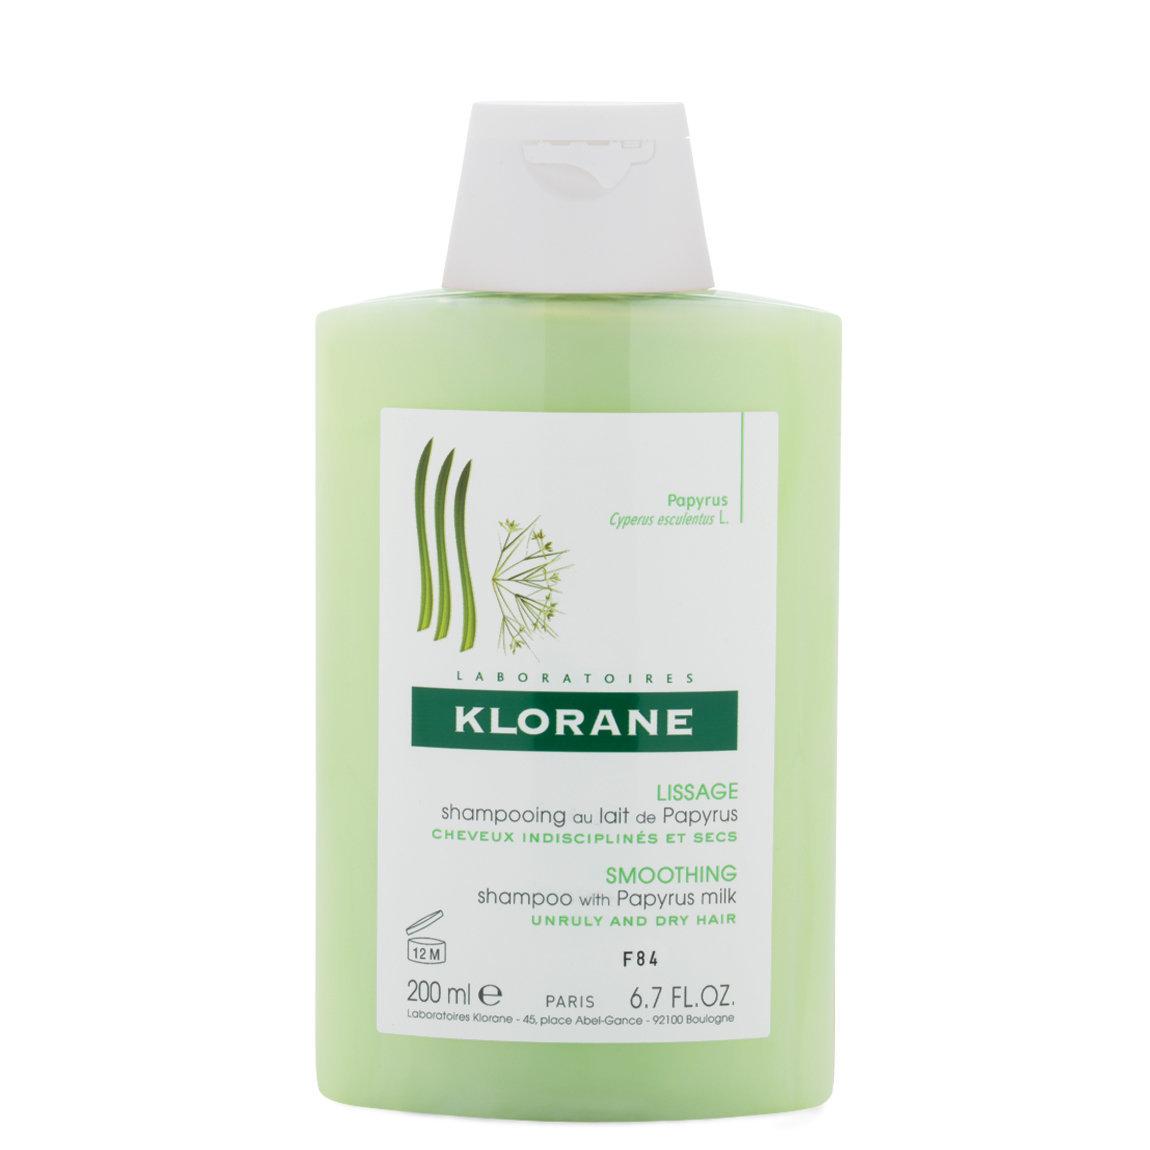 Klorane Shampoo with Papyrus Milk 6.7 oz alternative view 1 - product swatch.